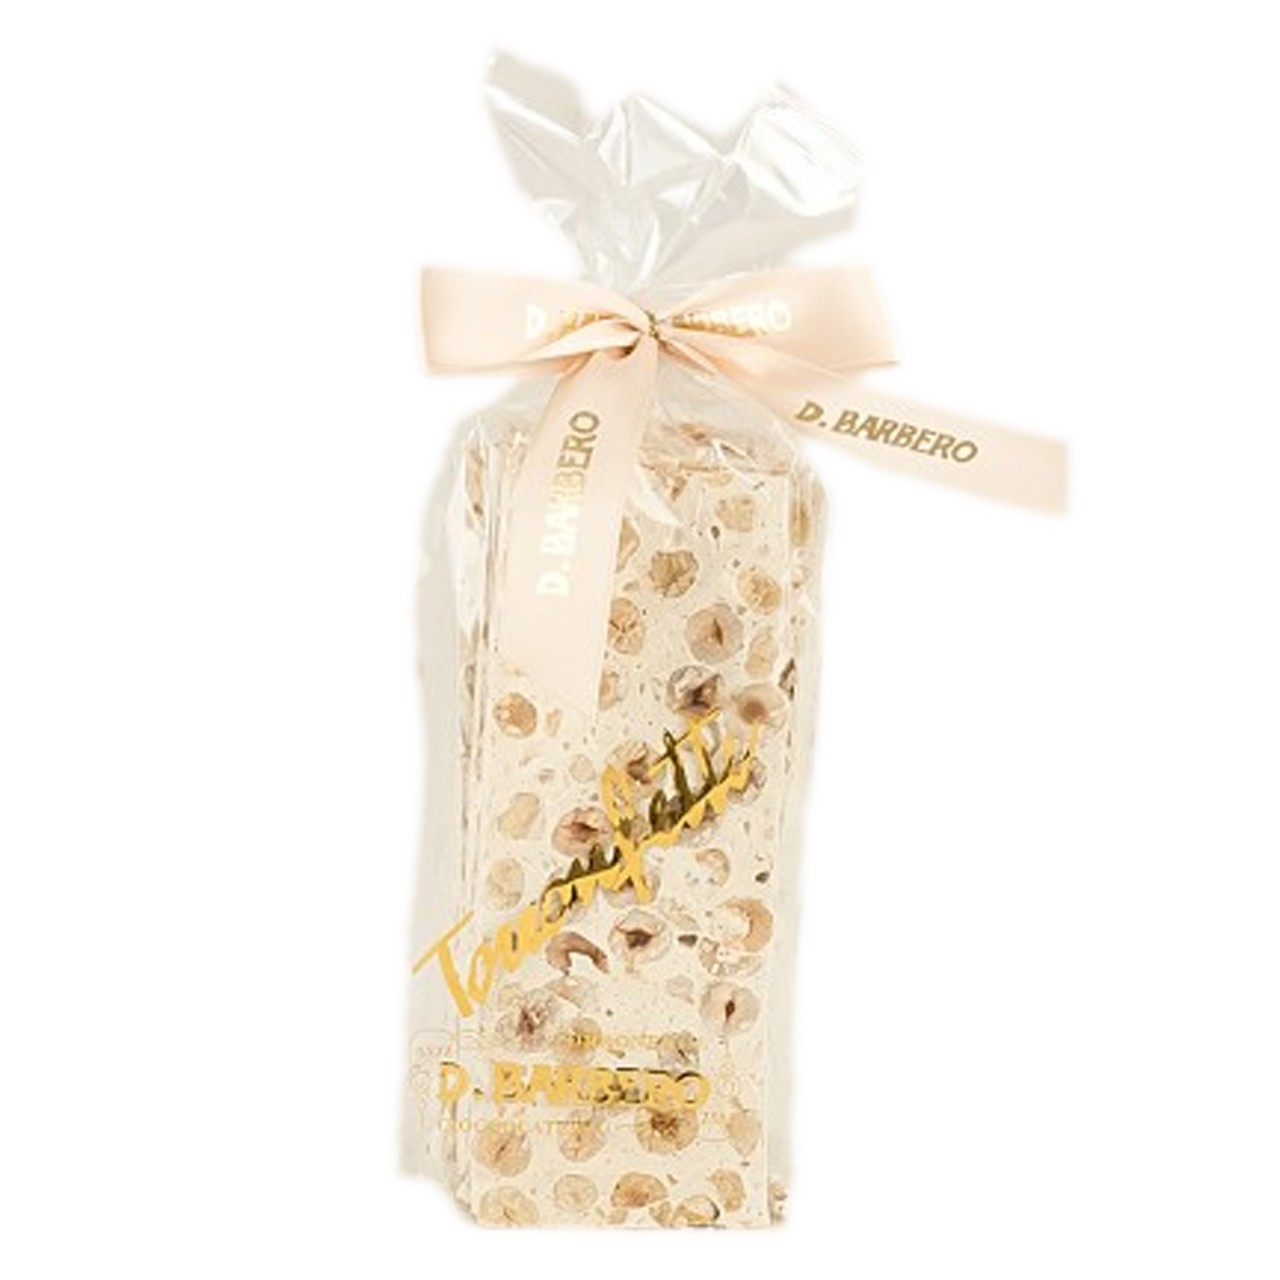 Torronfette with Piedmont hazelnuts IGP in bag